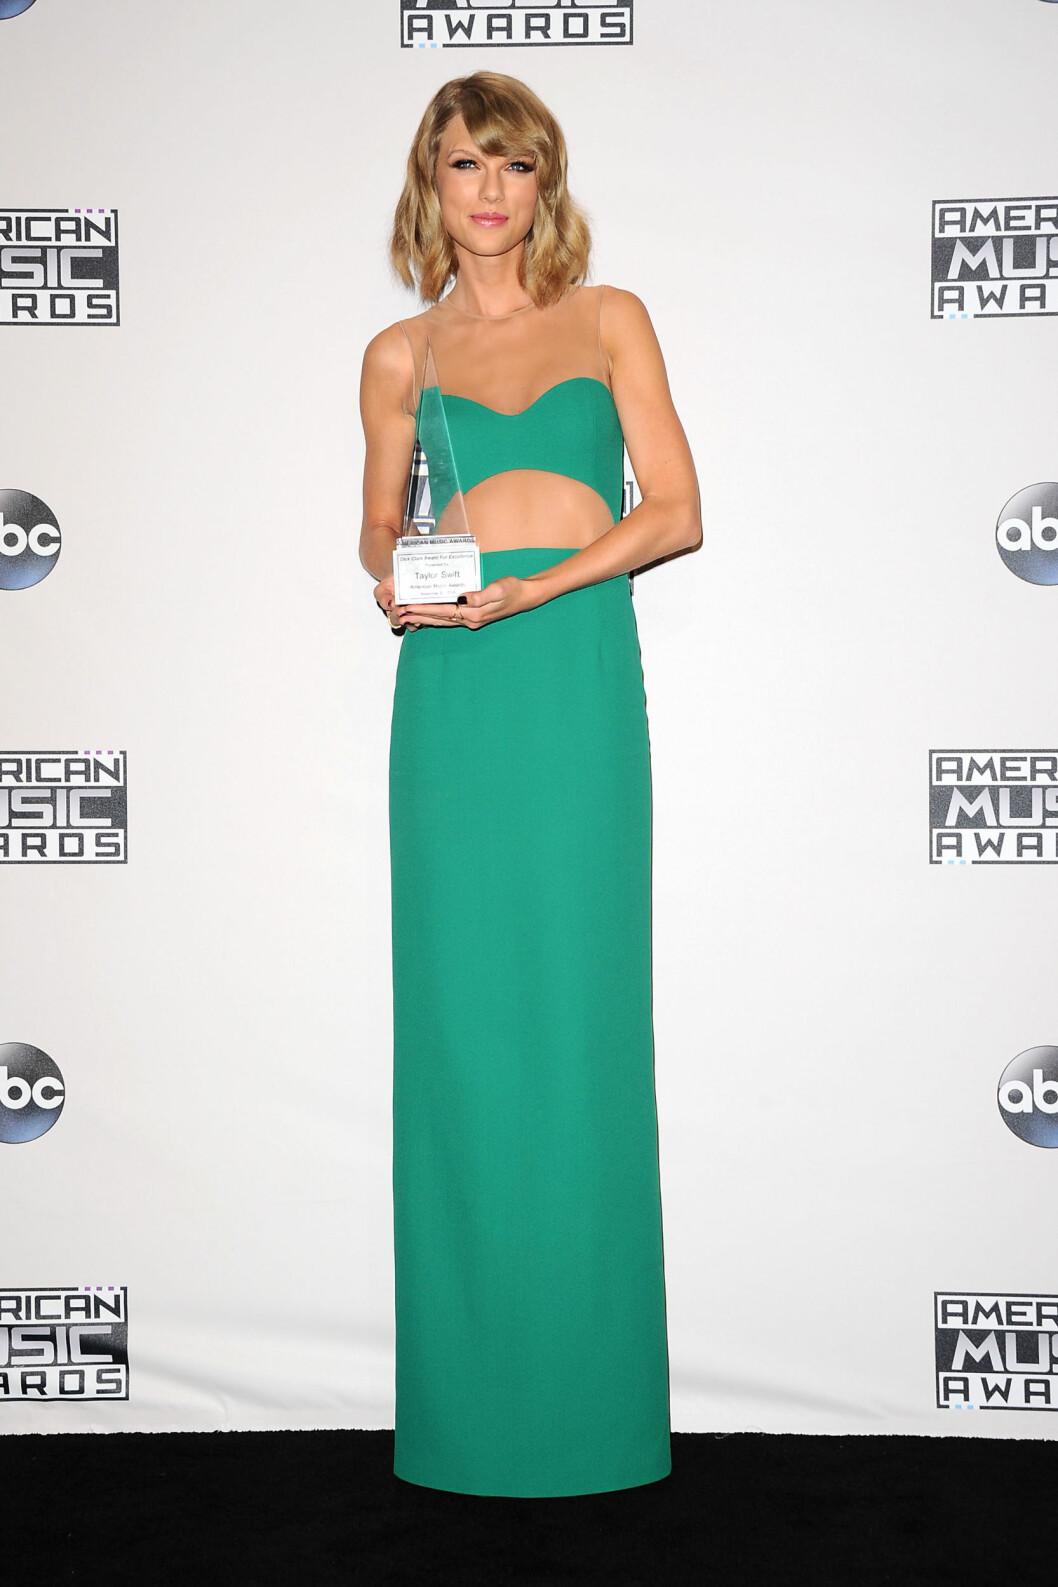 Taylor Swift  Foto: KYLE ROVER/startraksphoto.com/Al